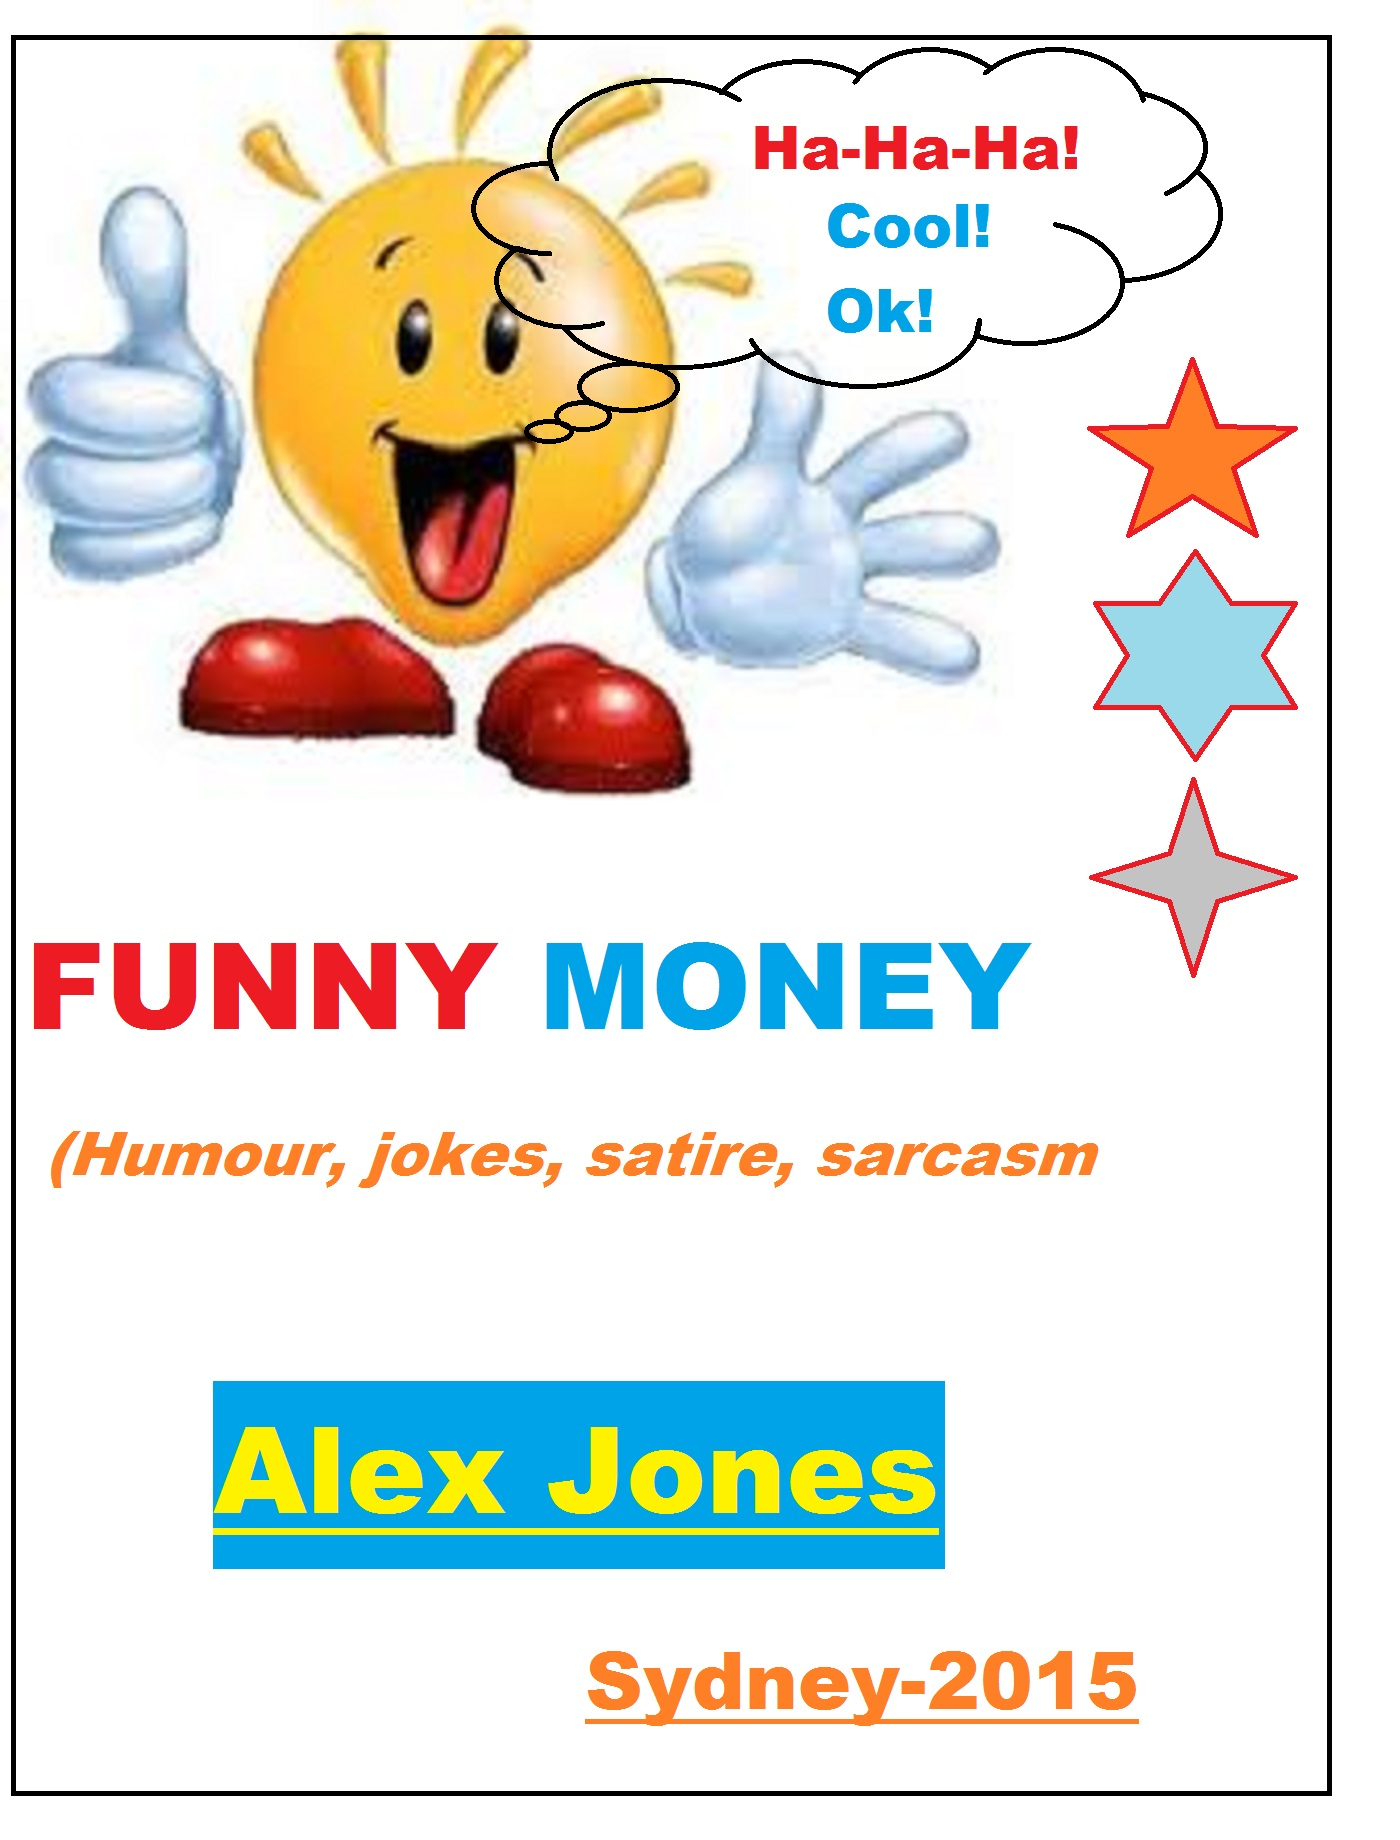 Smashwords Funny Money Humour Jokes Satire Sarcasm A Book